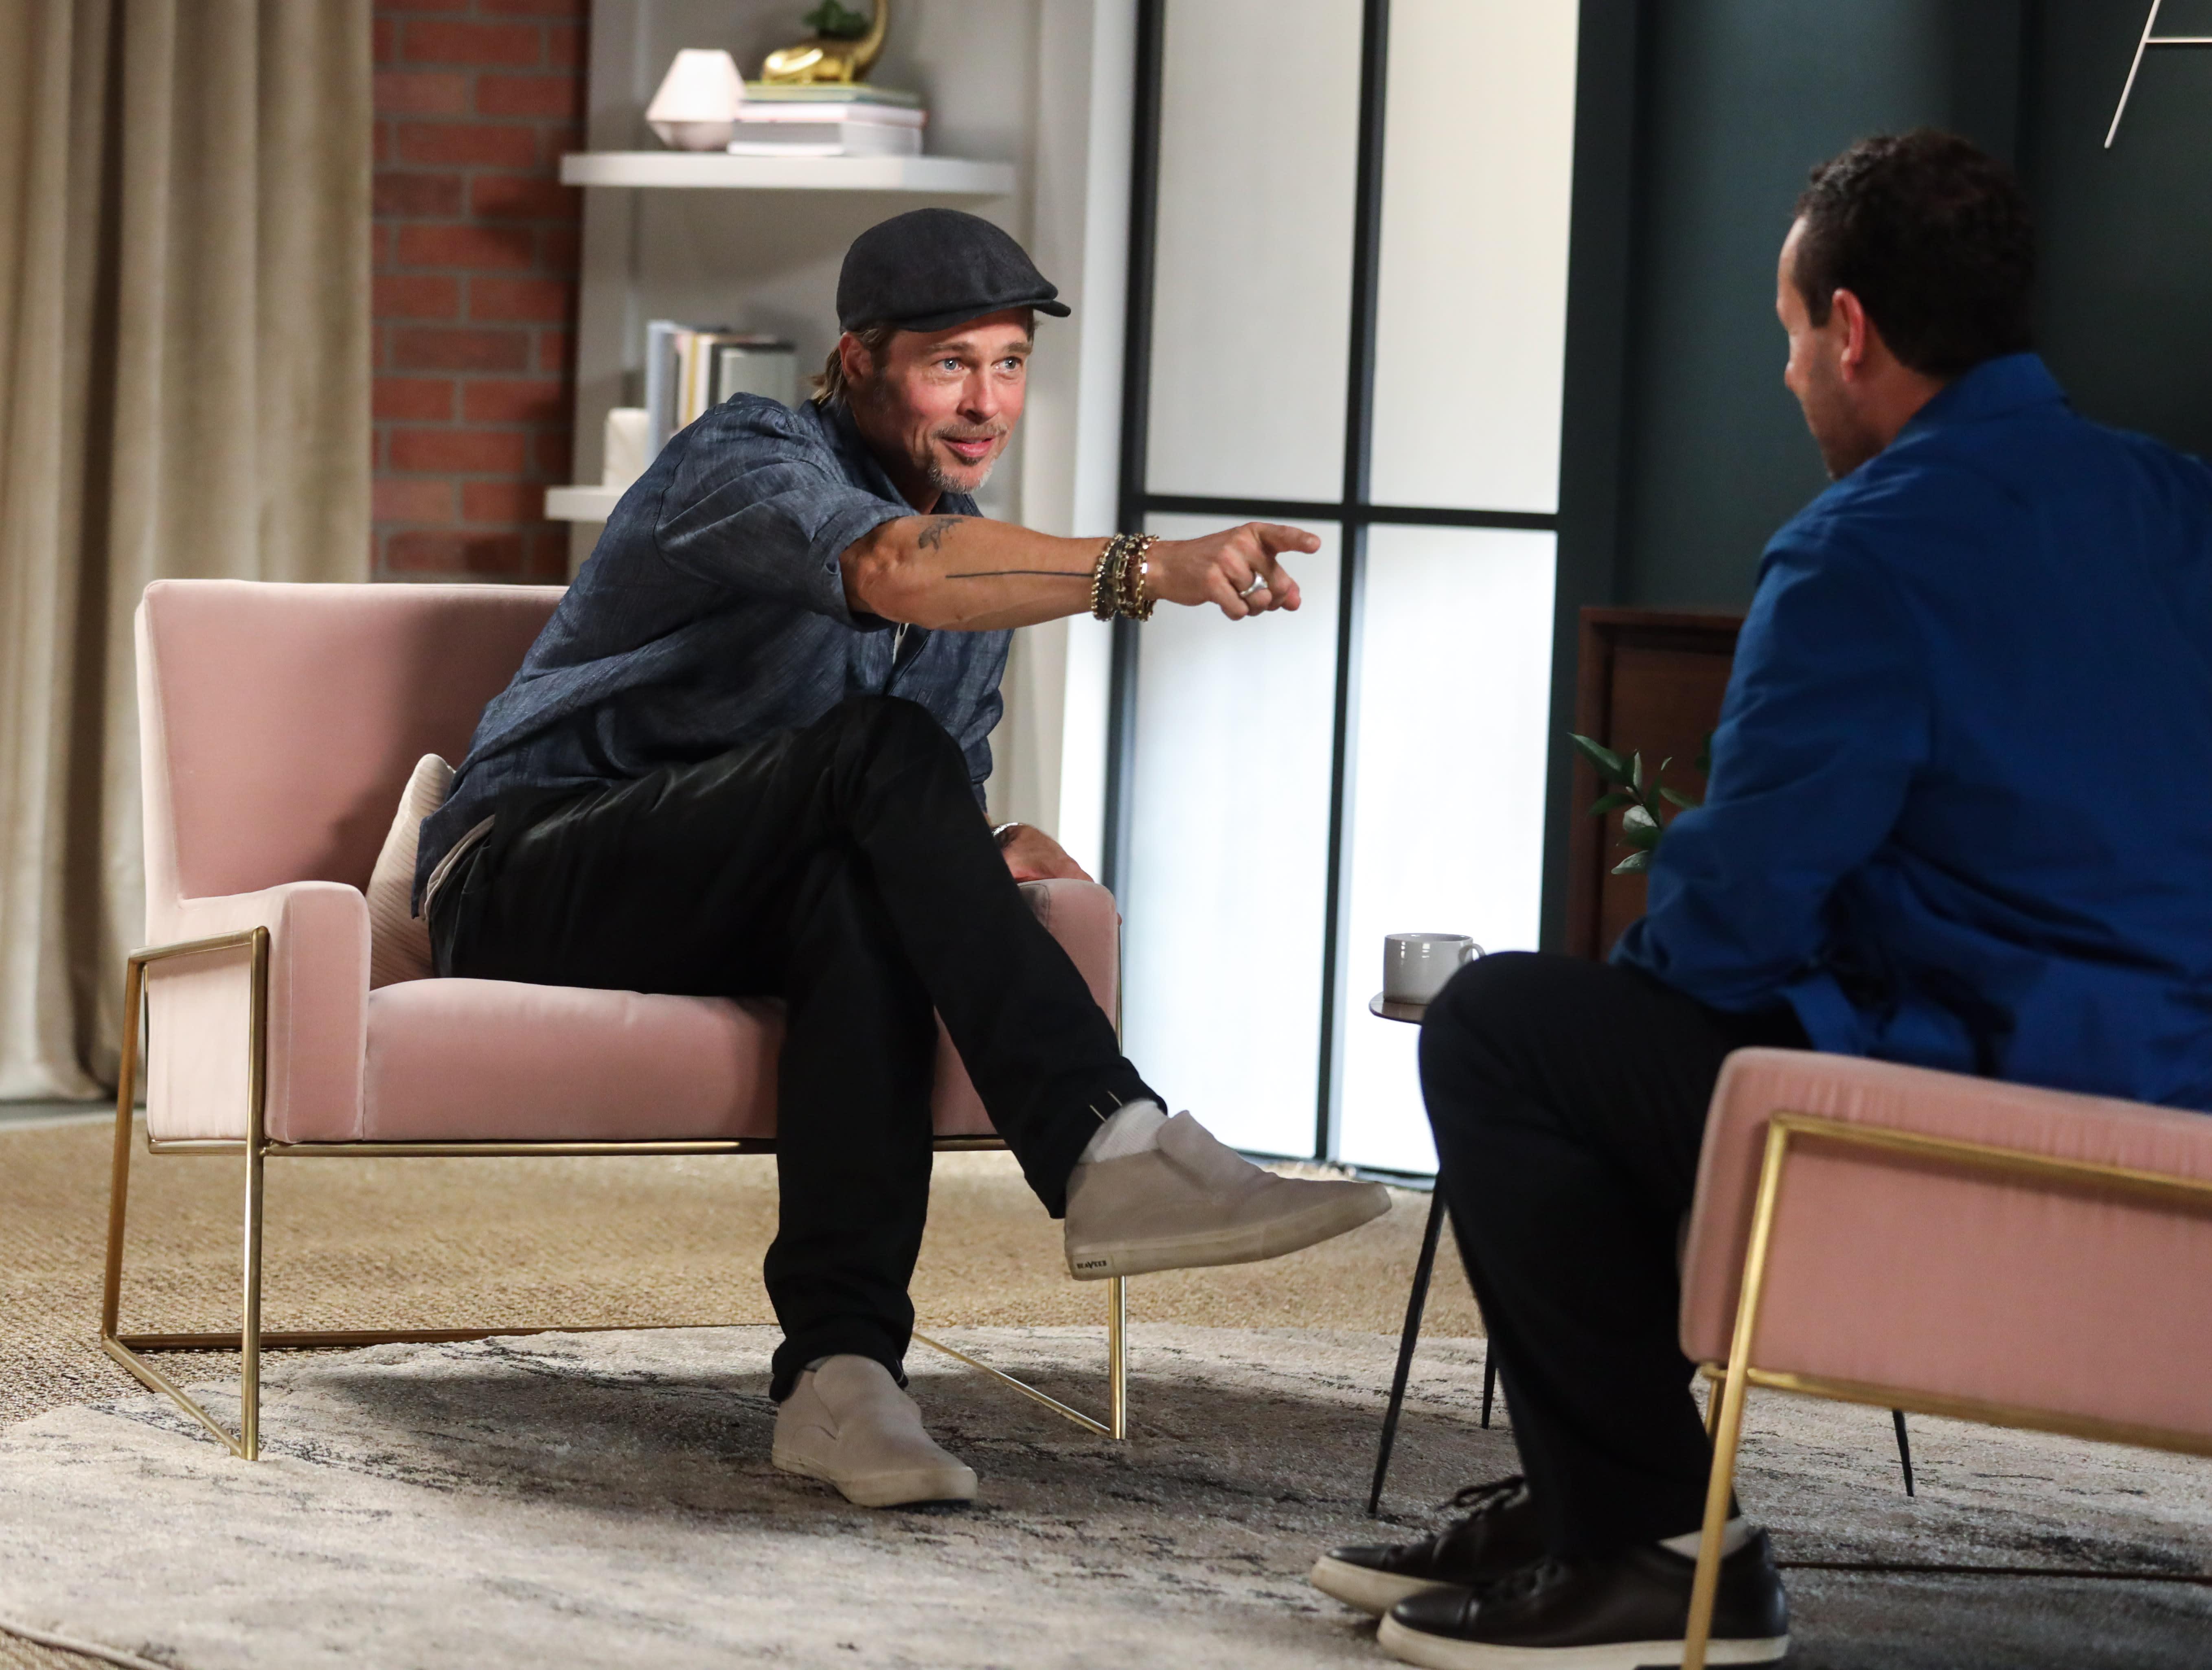 Brad Pitt and Adam Sandler Debate the Pros and Cons of Netflix - Yahoo Entertainment